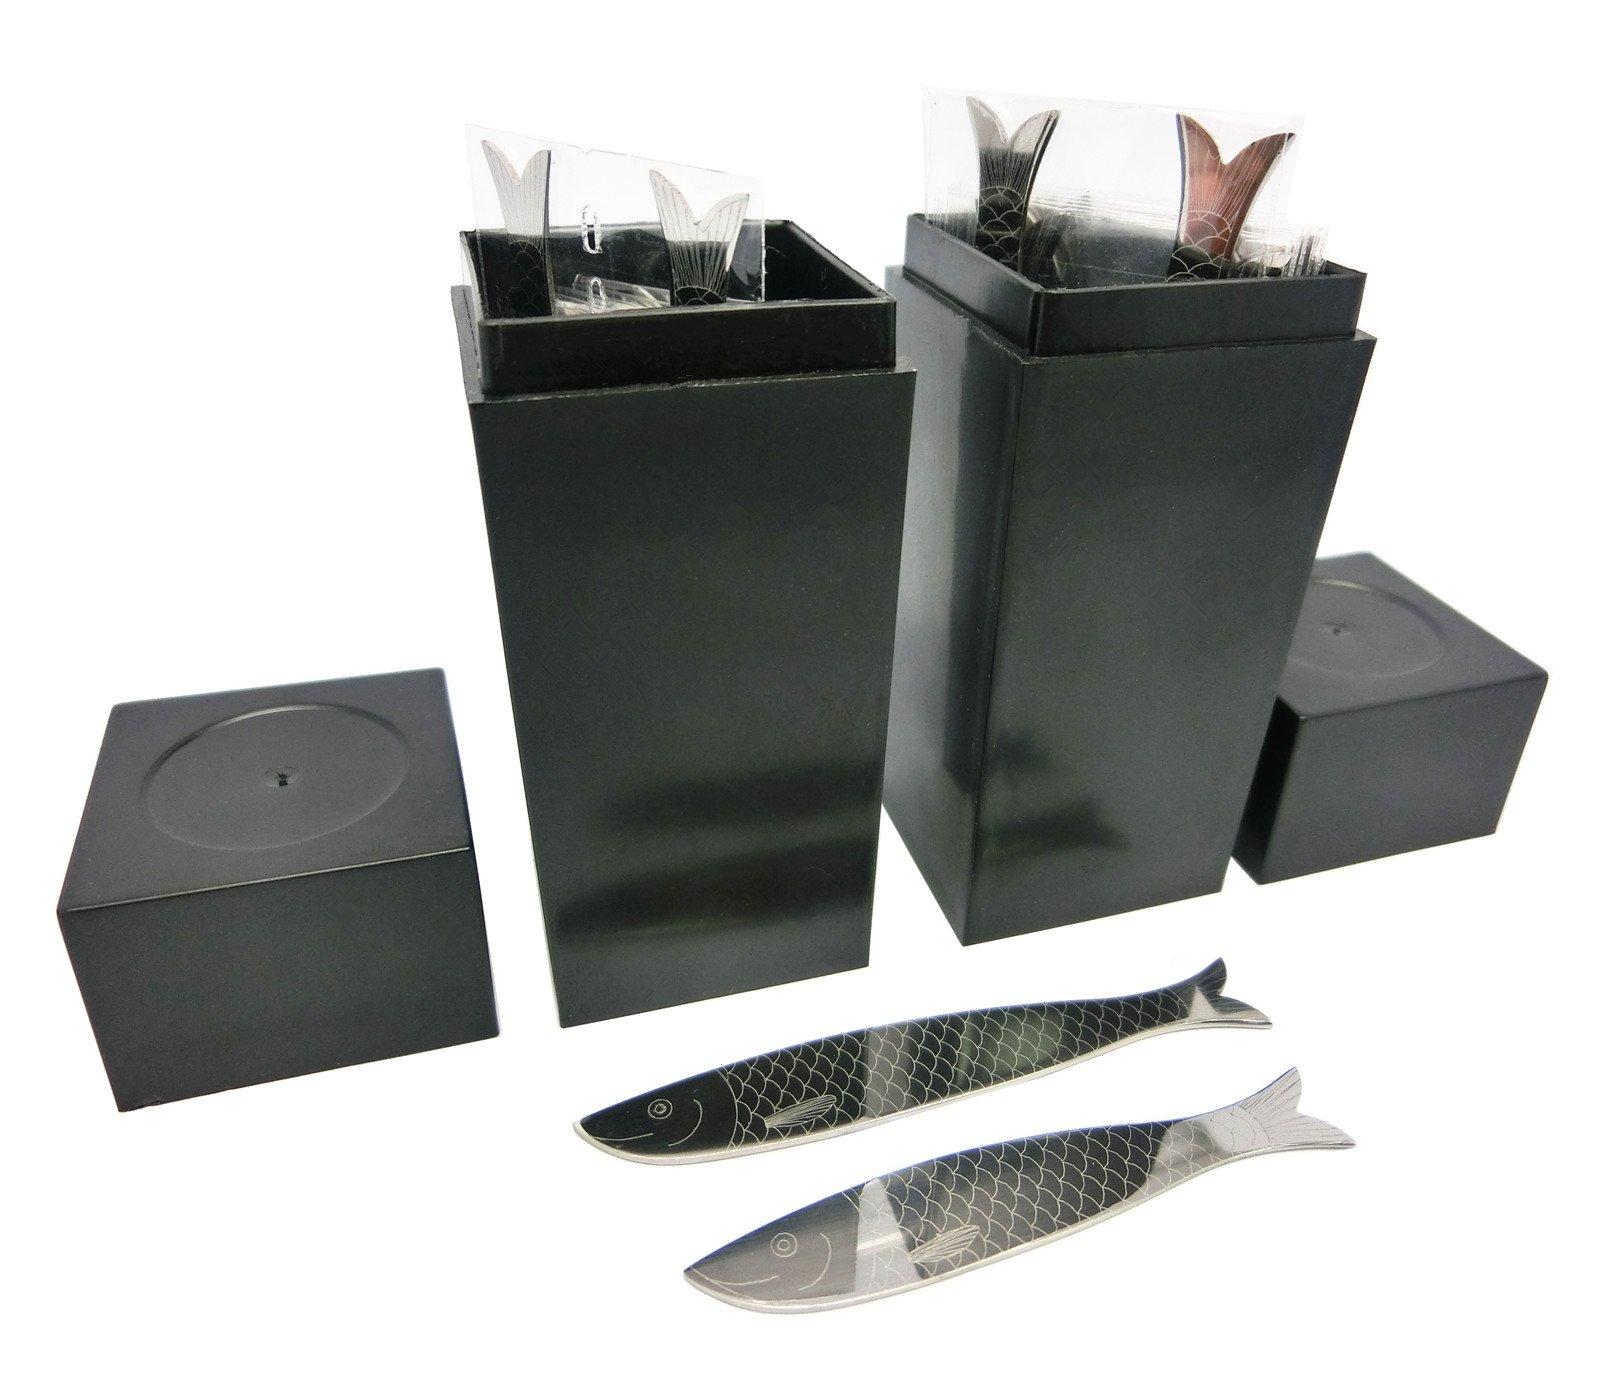 Shang Zun 40 Pcs Fish Design Metal Collar Stays in 2 Black Box, 2.2''/ 2.5''